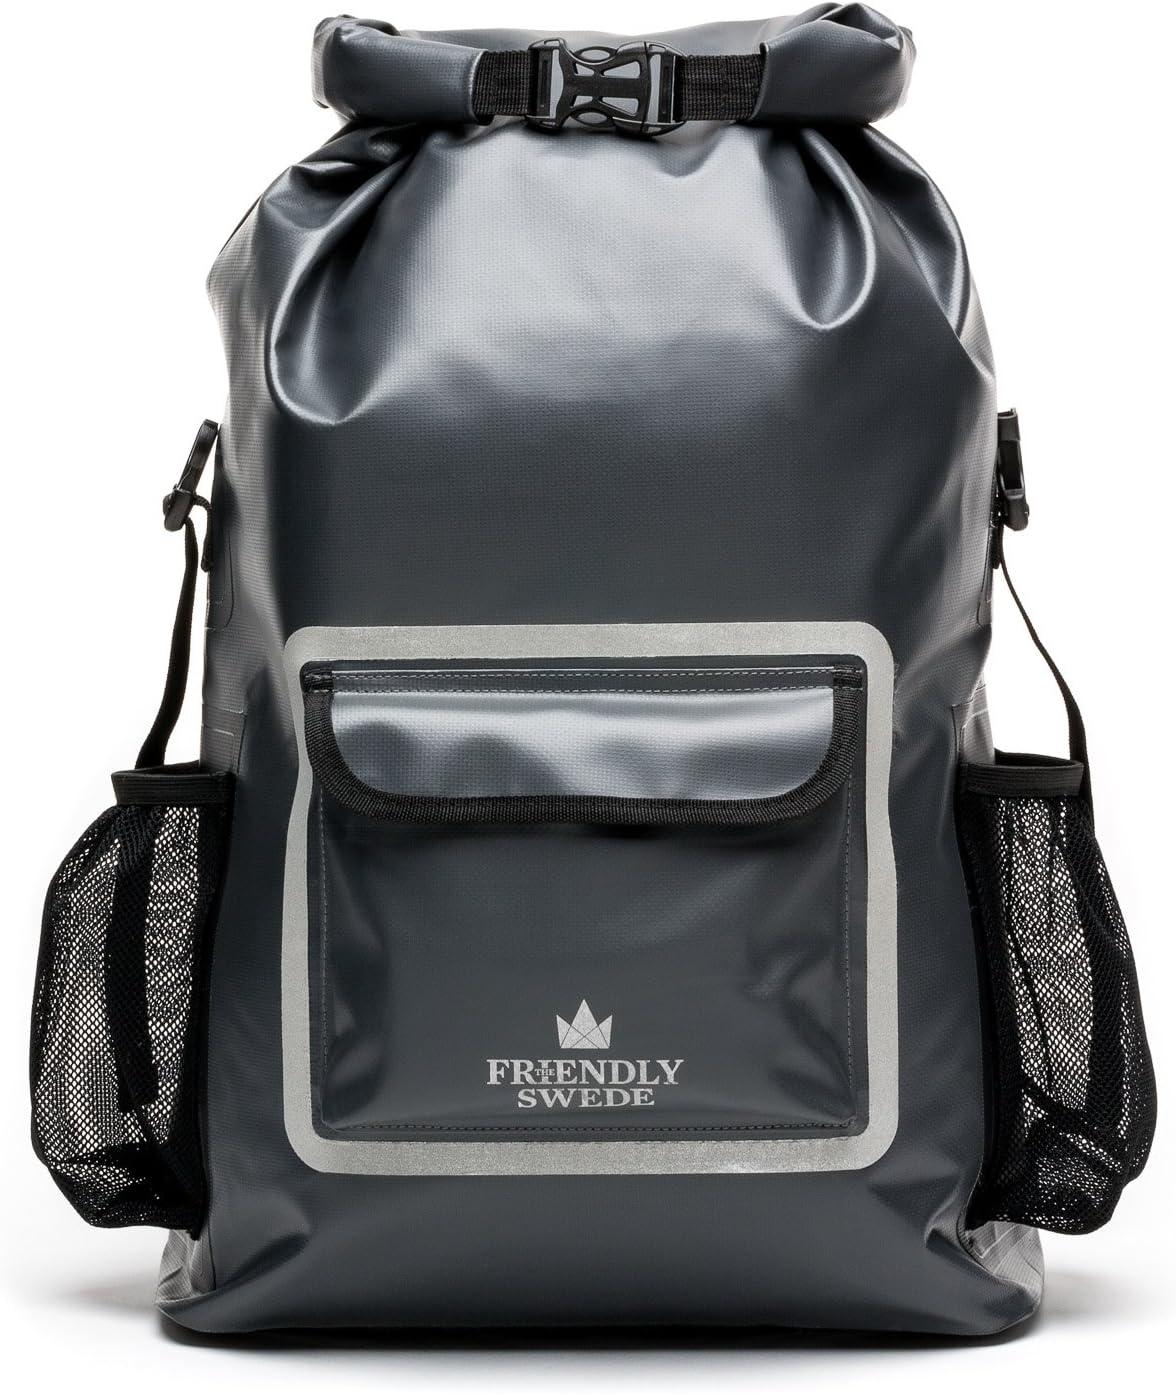 The Friendly Swede Waterproof Backpack Dry Bag 33L, Ergonomic Hiking Rucksack